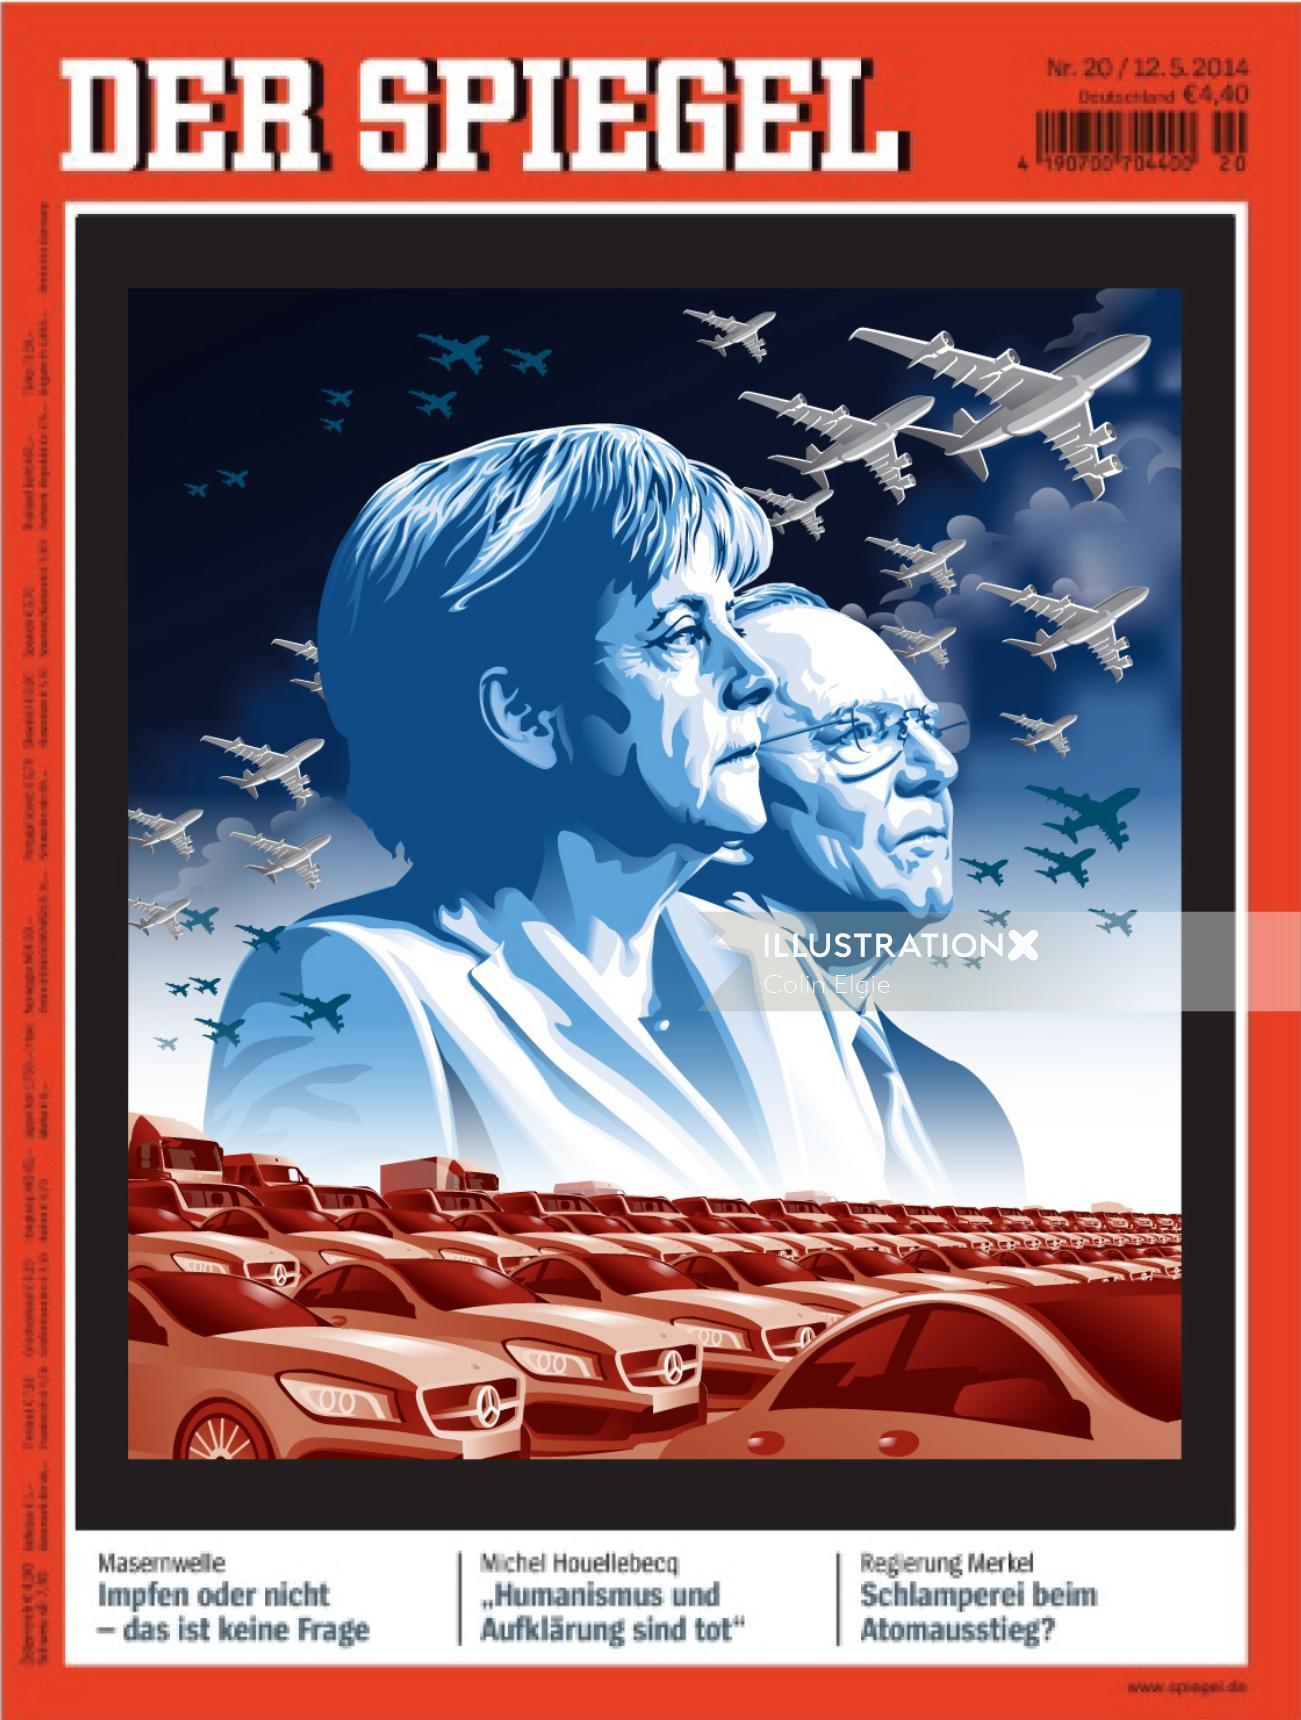 Illustration for Der Spiegel series